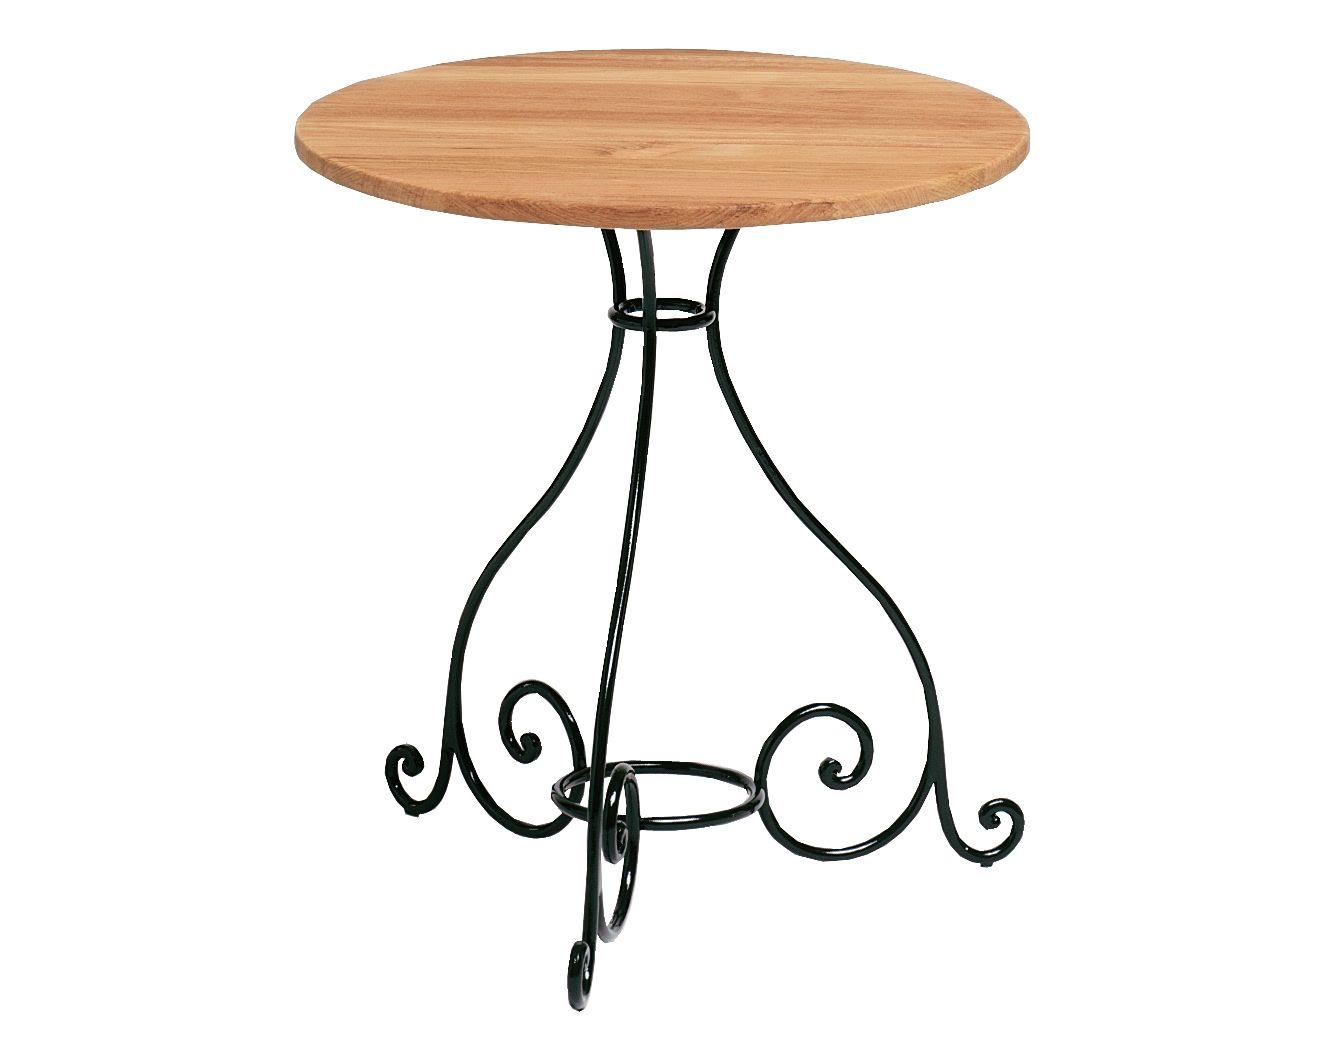 Tisch Classic, Ø 65 cm